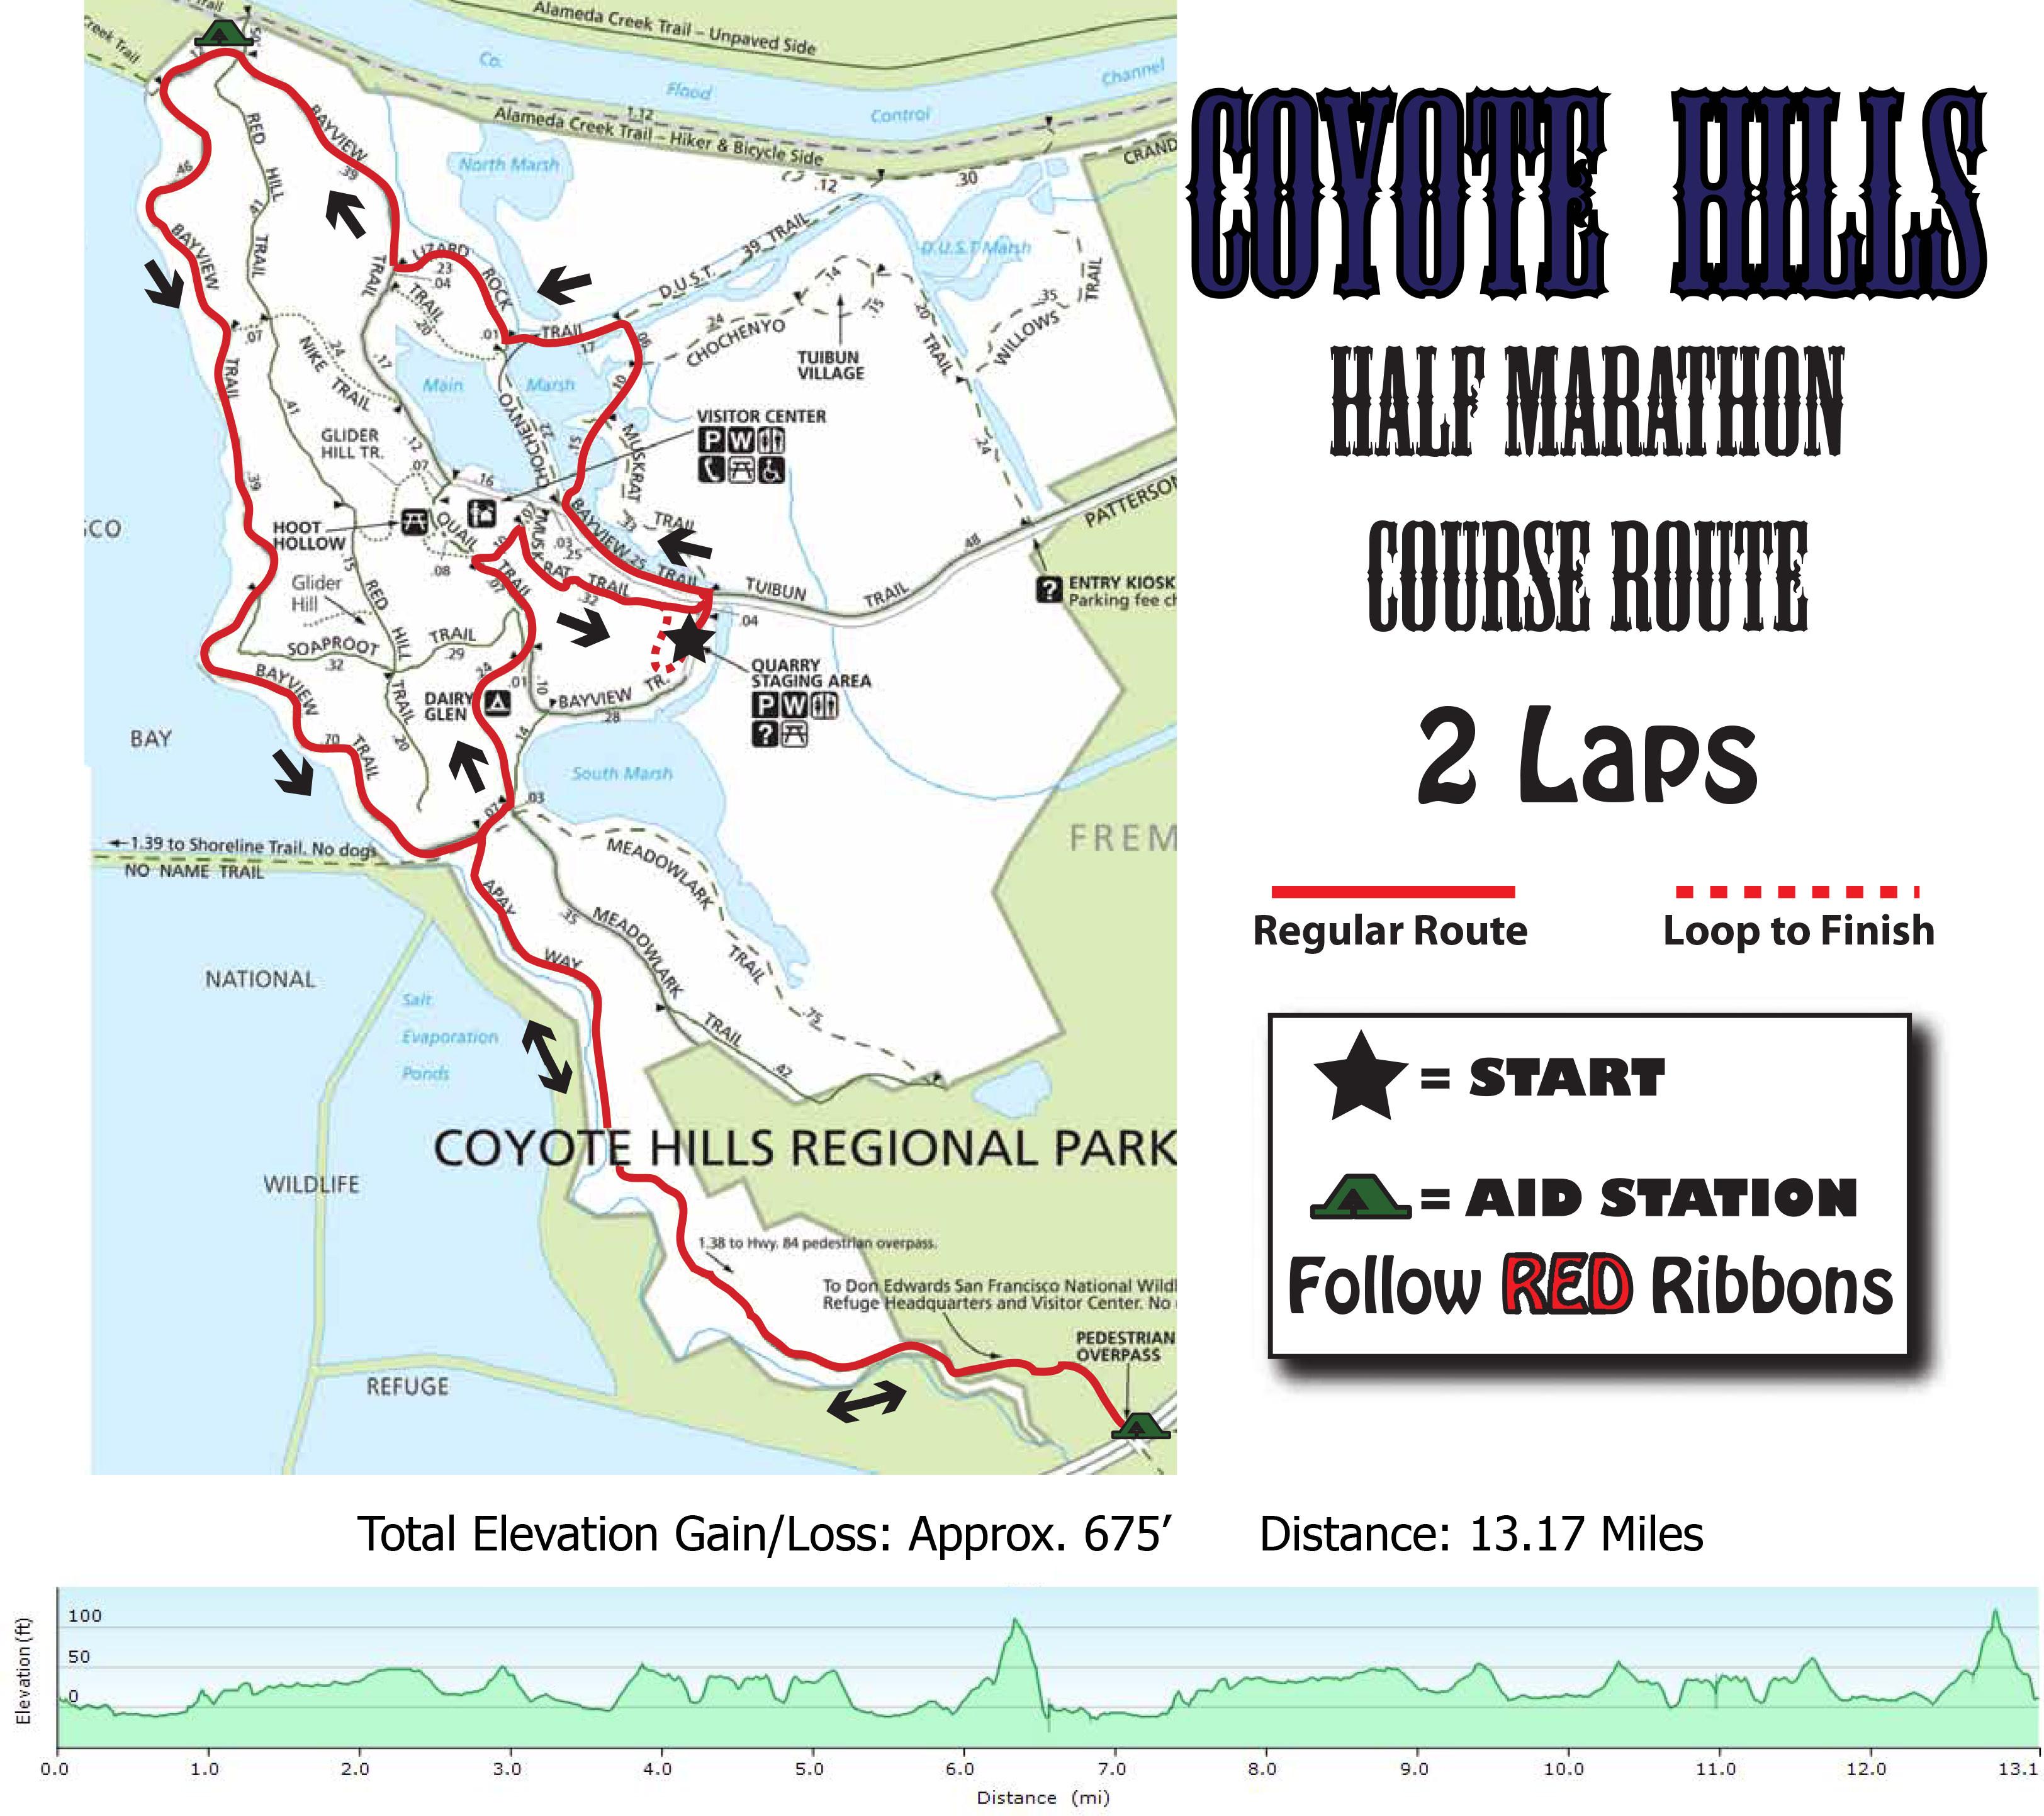 Coyote Hills Half Marathon Map and Elevation Chart